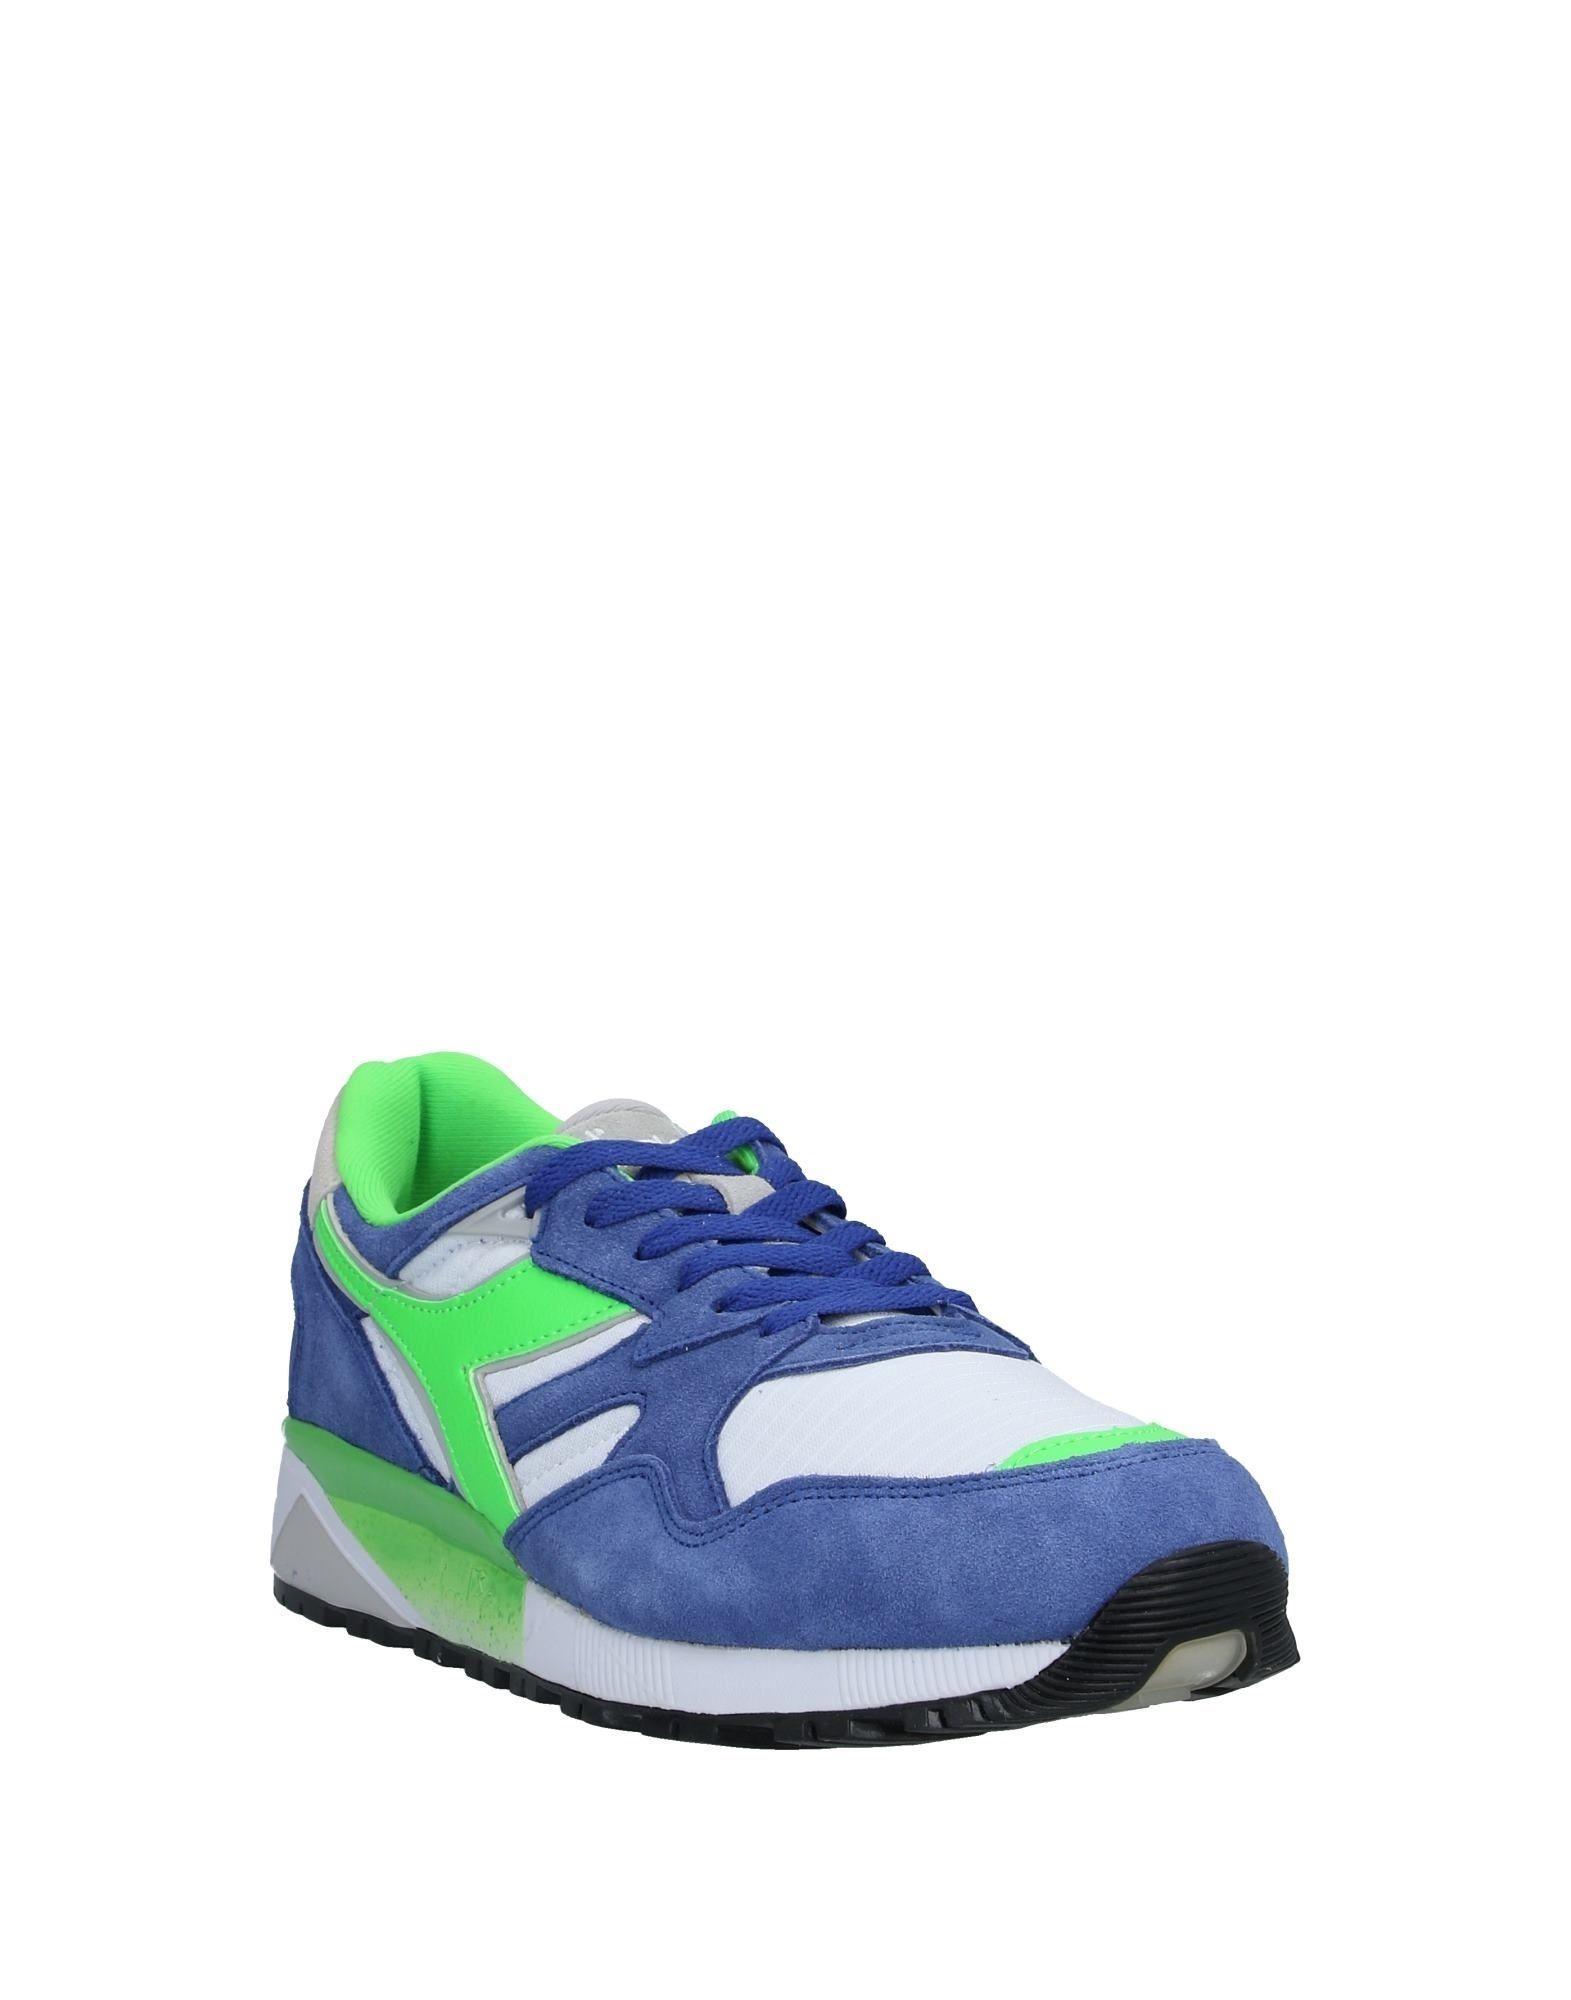 Sneakers & Deportivas Diadora de hombre de color Azul